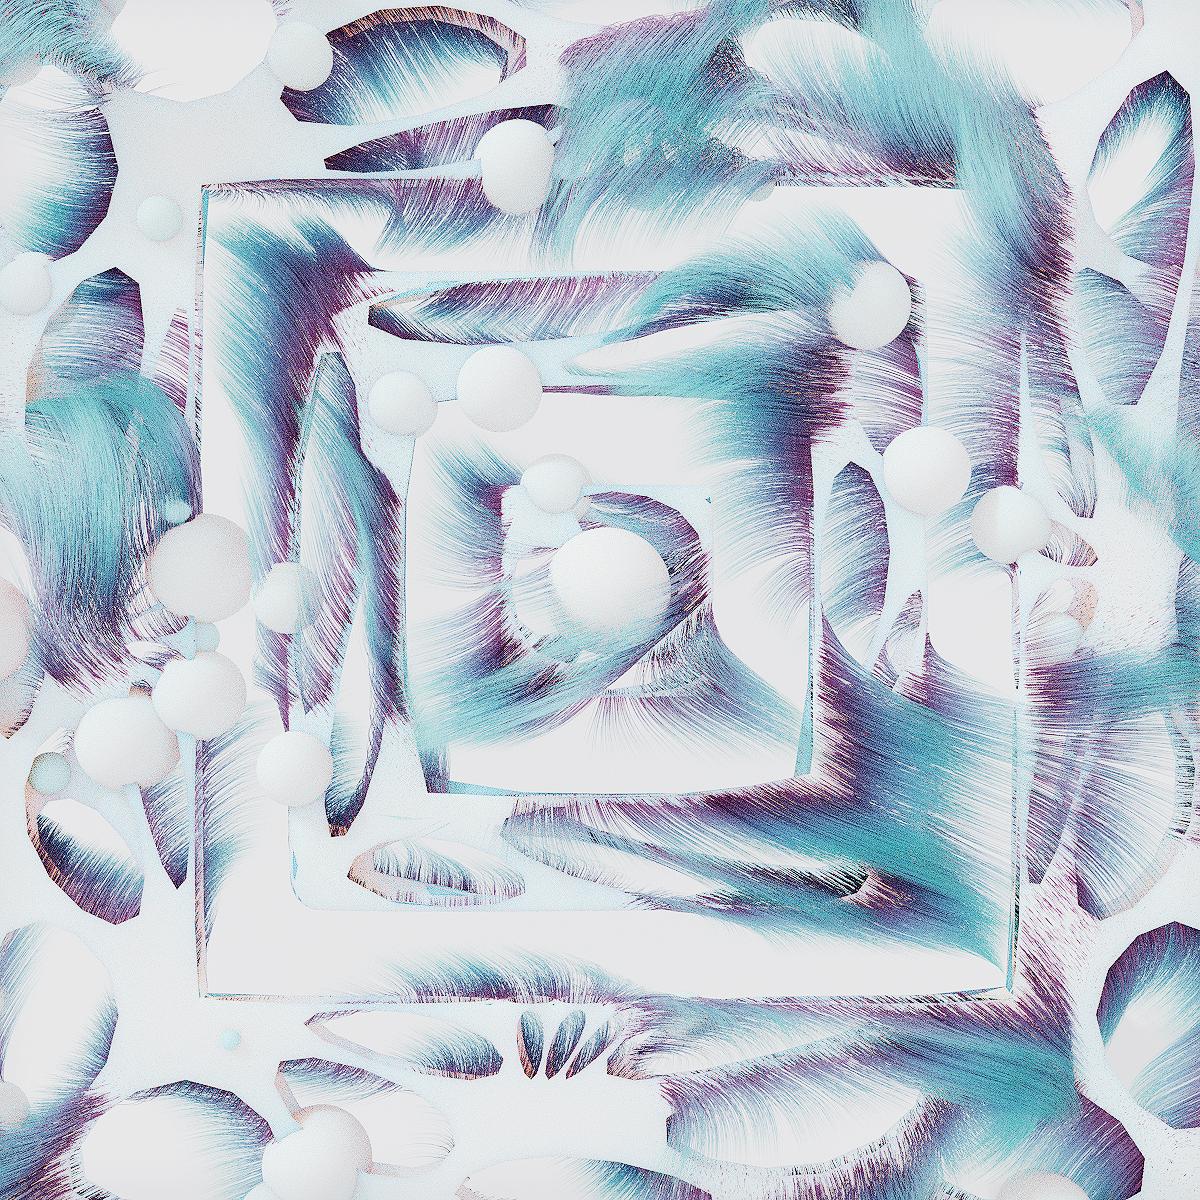 Trace  #daily #everyday #render #blender #3d #cgi #abstract #art #graphicdesign #digital #digitalart #modern #cgiart #b3d #3dart #computerart #minimalist #color #colour #abstractart #surreal #surrealart pic.twitter.com/cz4t3Y7Jl9